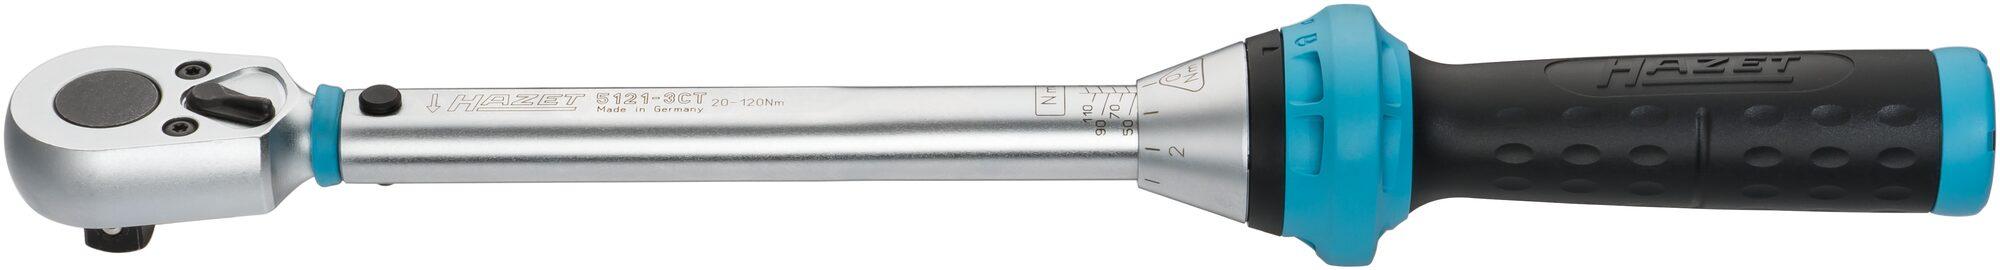 HAZET Drehmoment-Schlüssel 5121-3CT ∙ Nm min-max: 20–120 Nm ∙ Toleranz: 3% ∙ Vierkant massiv 12,5 mm (1/2 Zoll)